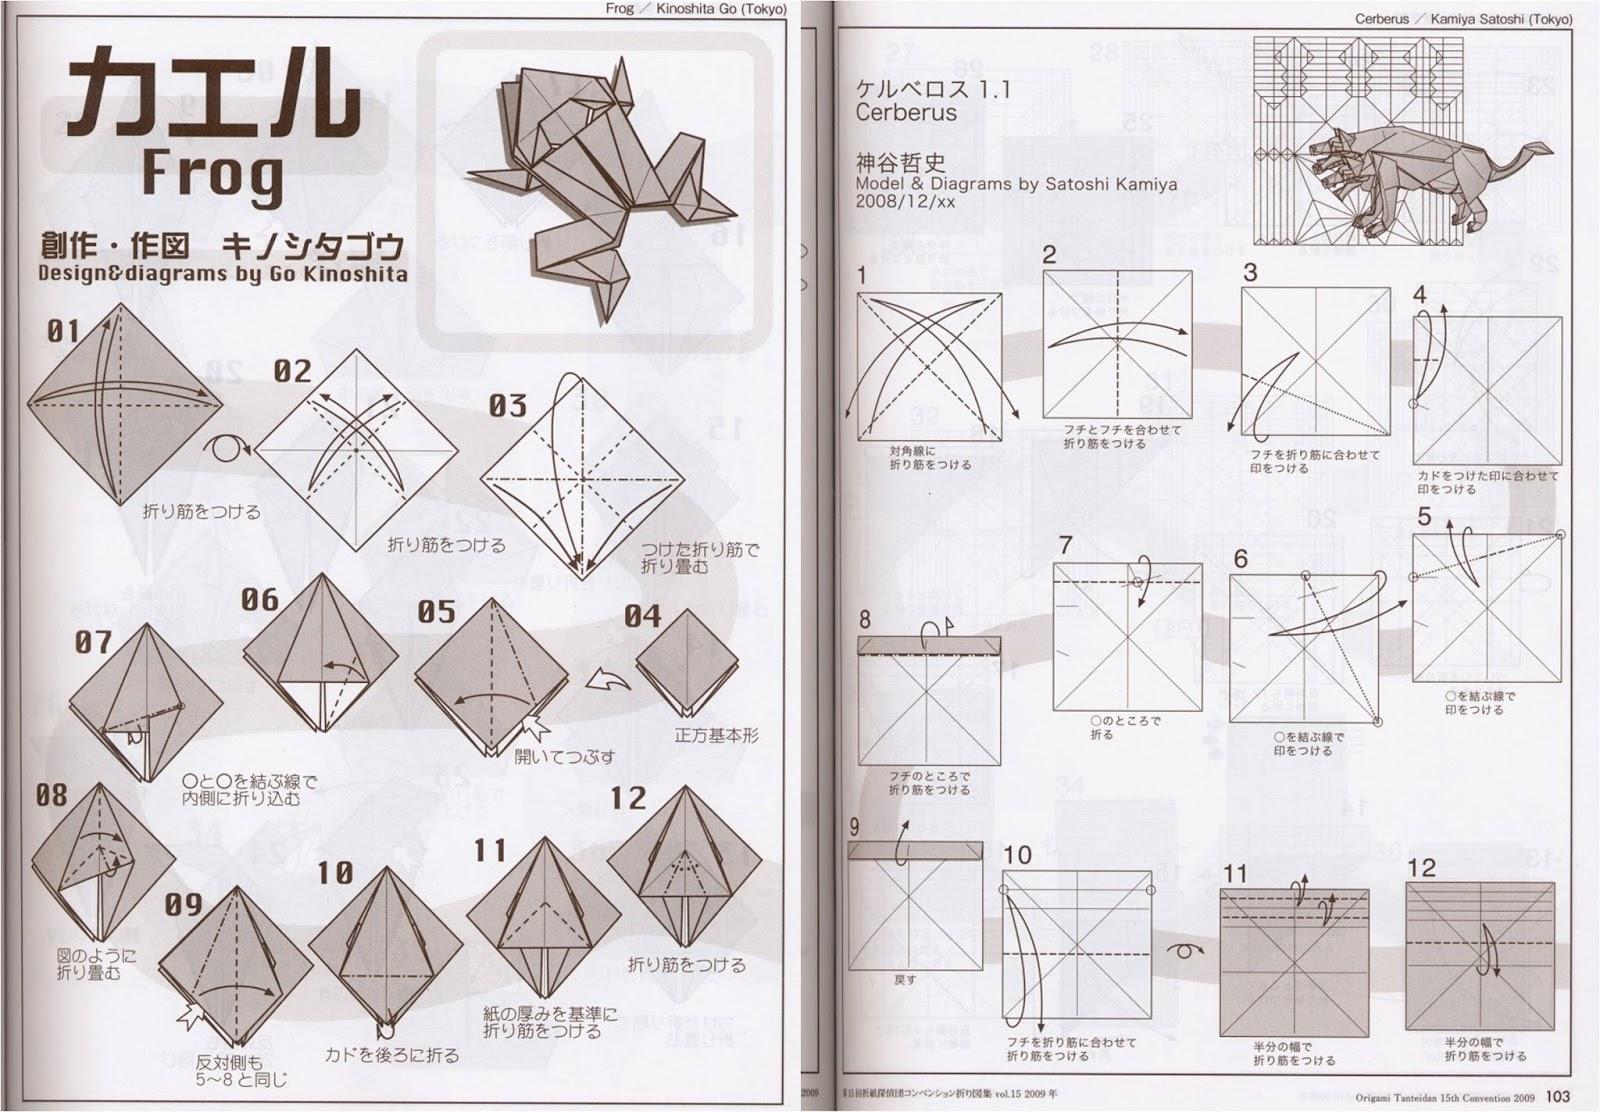 Origami Tanteidan Convention 18 Pdf